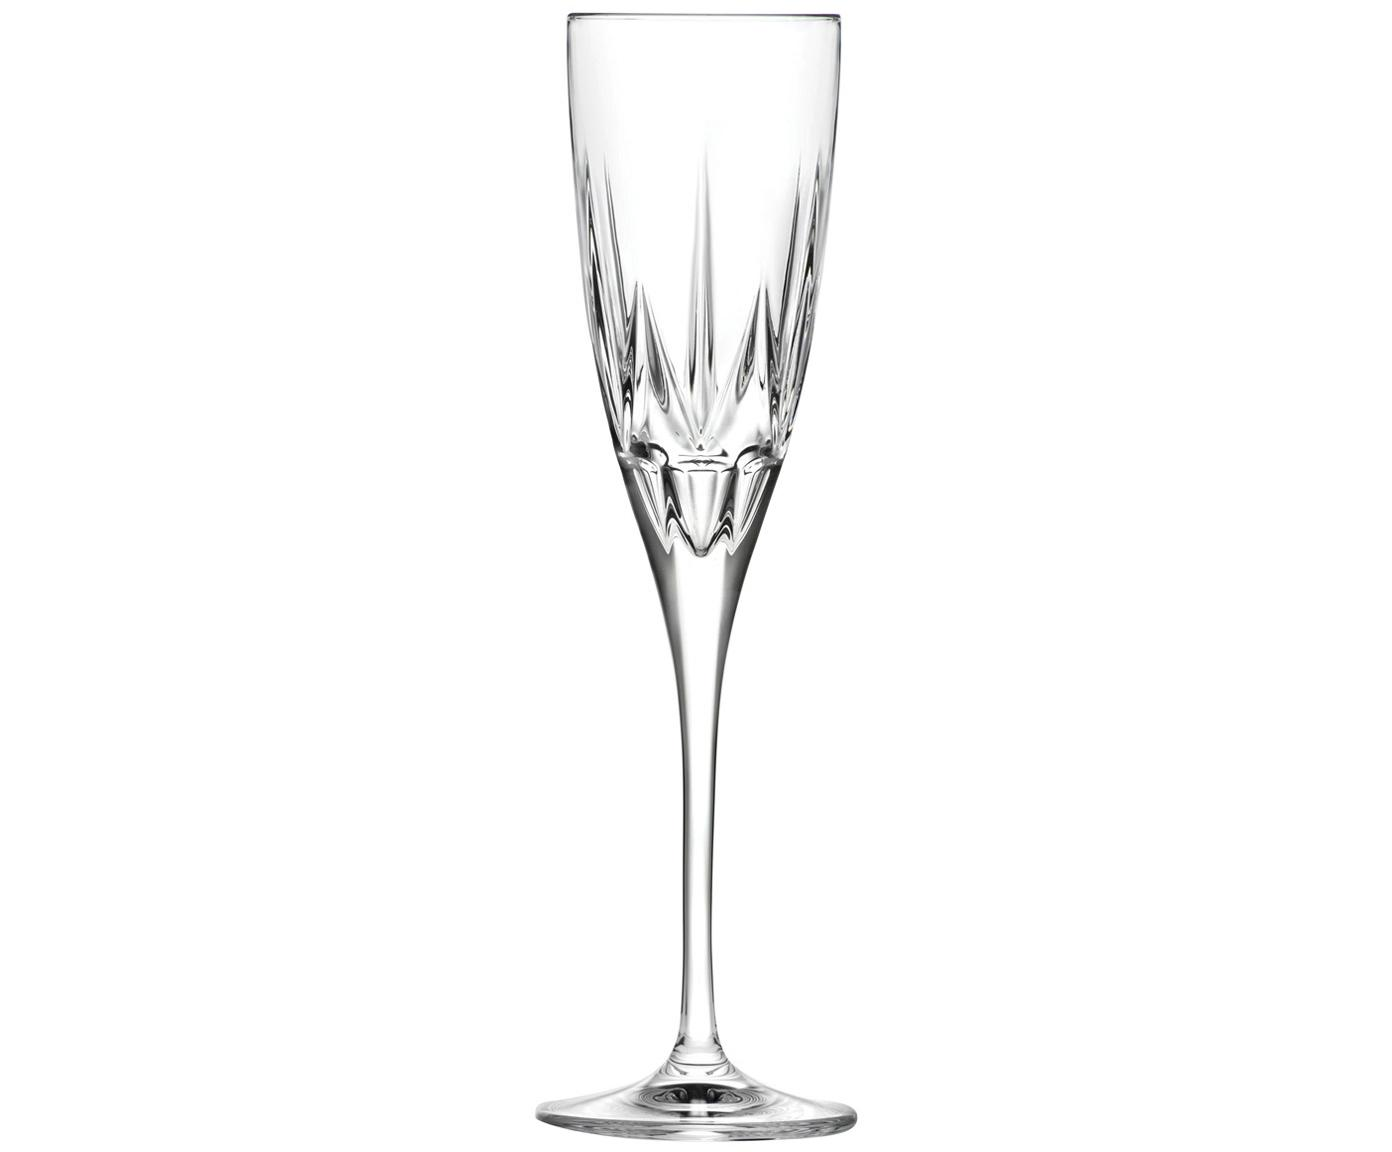 Kristallen champagneglazen Chic, 6 stuks, Kristalglas, Transparant, Ø 6 x H 24 cm